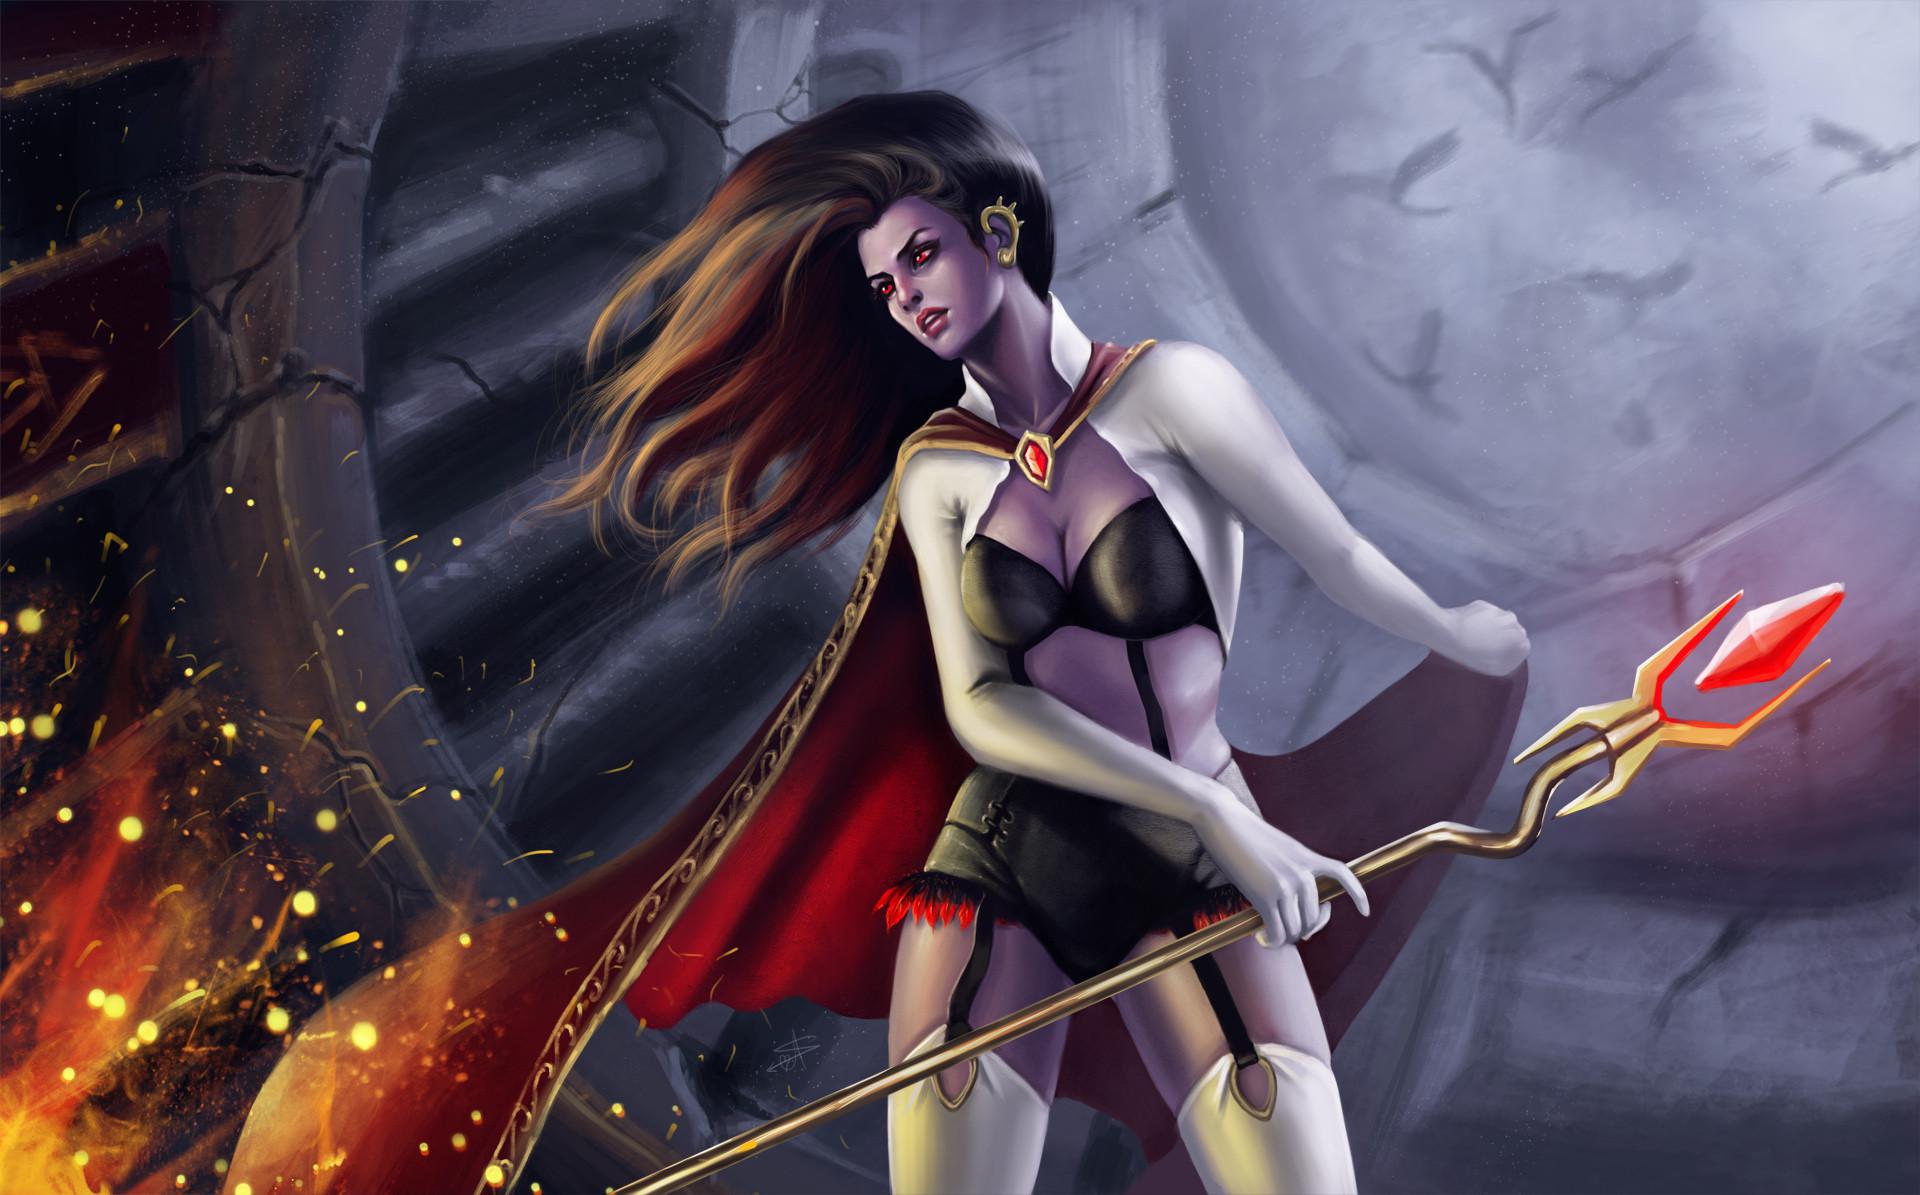 Fantasy – Warrior Fantasy Woman Girl Red Fire Sword Cape Wallpaper